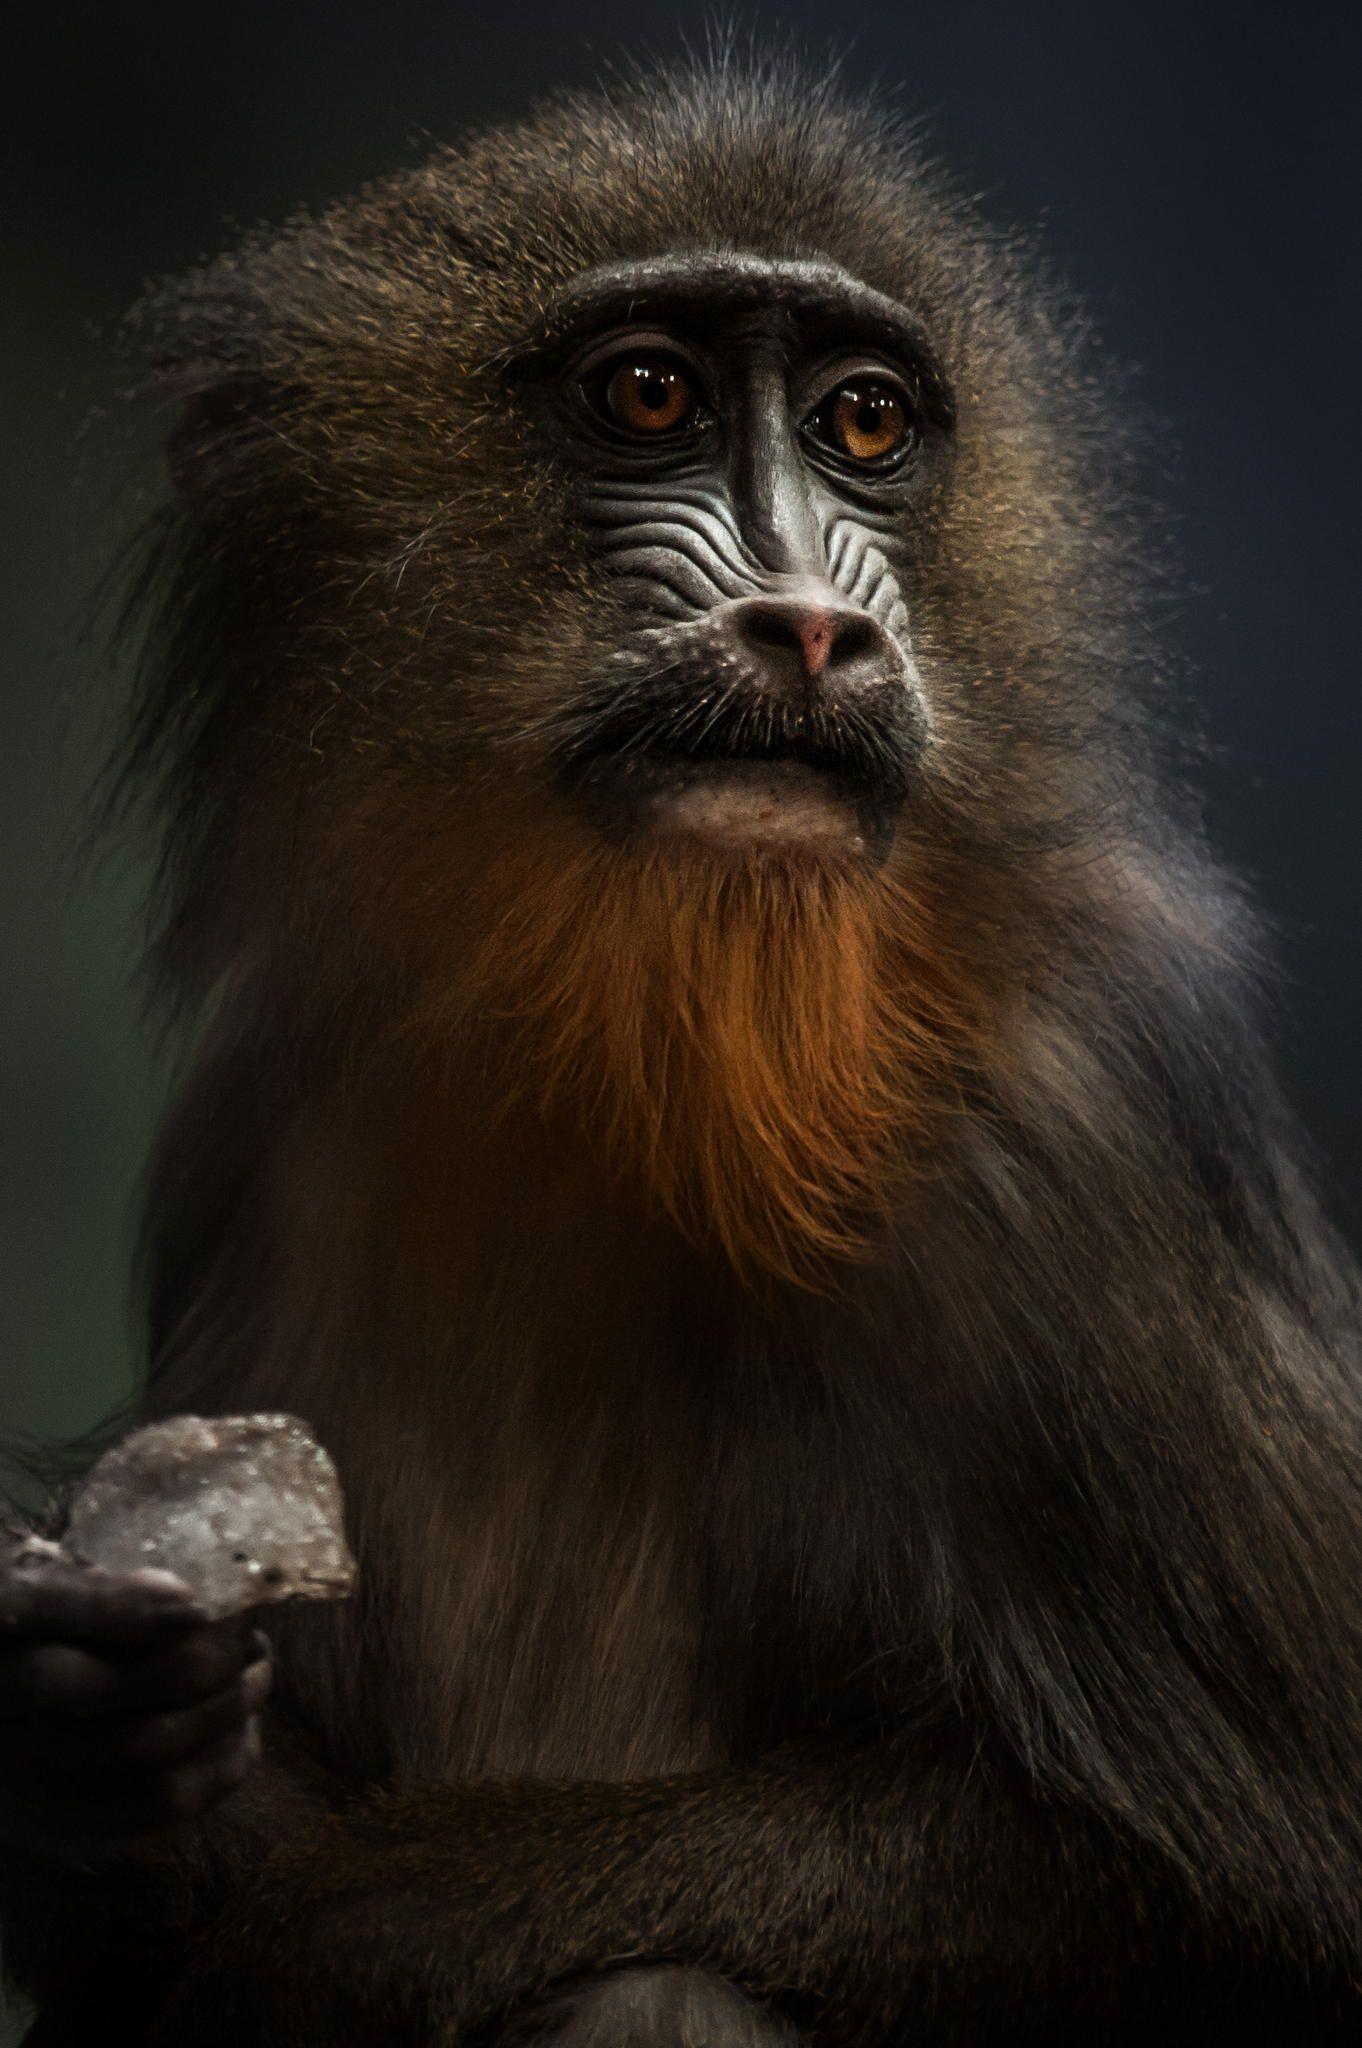 *mr_monkey by Michael Mareyen on 500px Rare animals